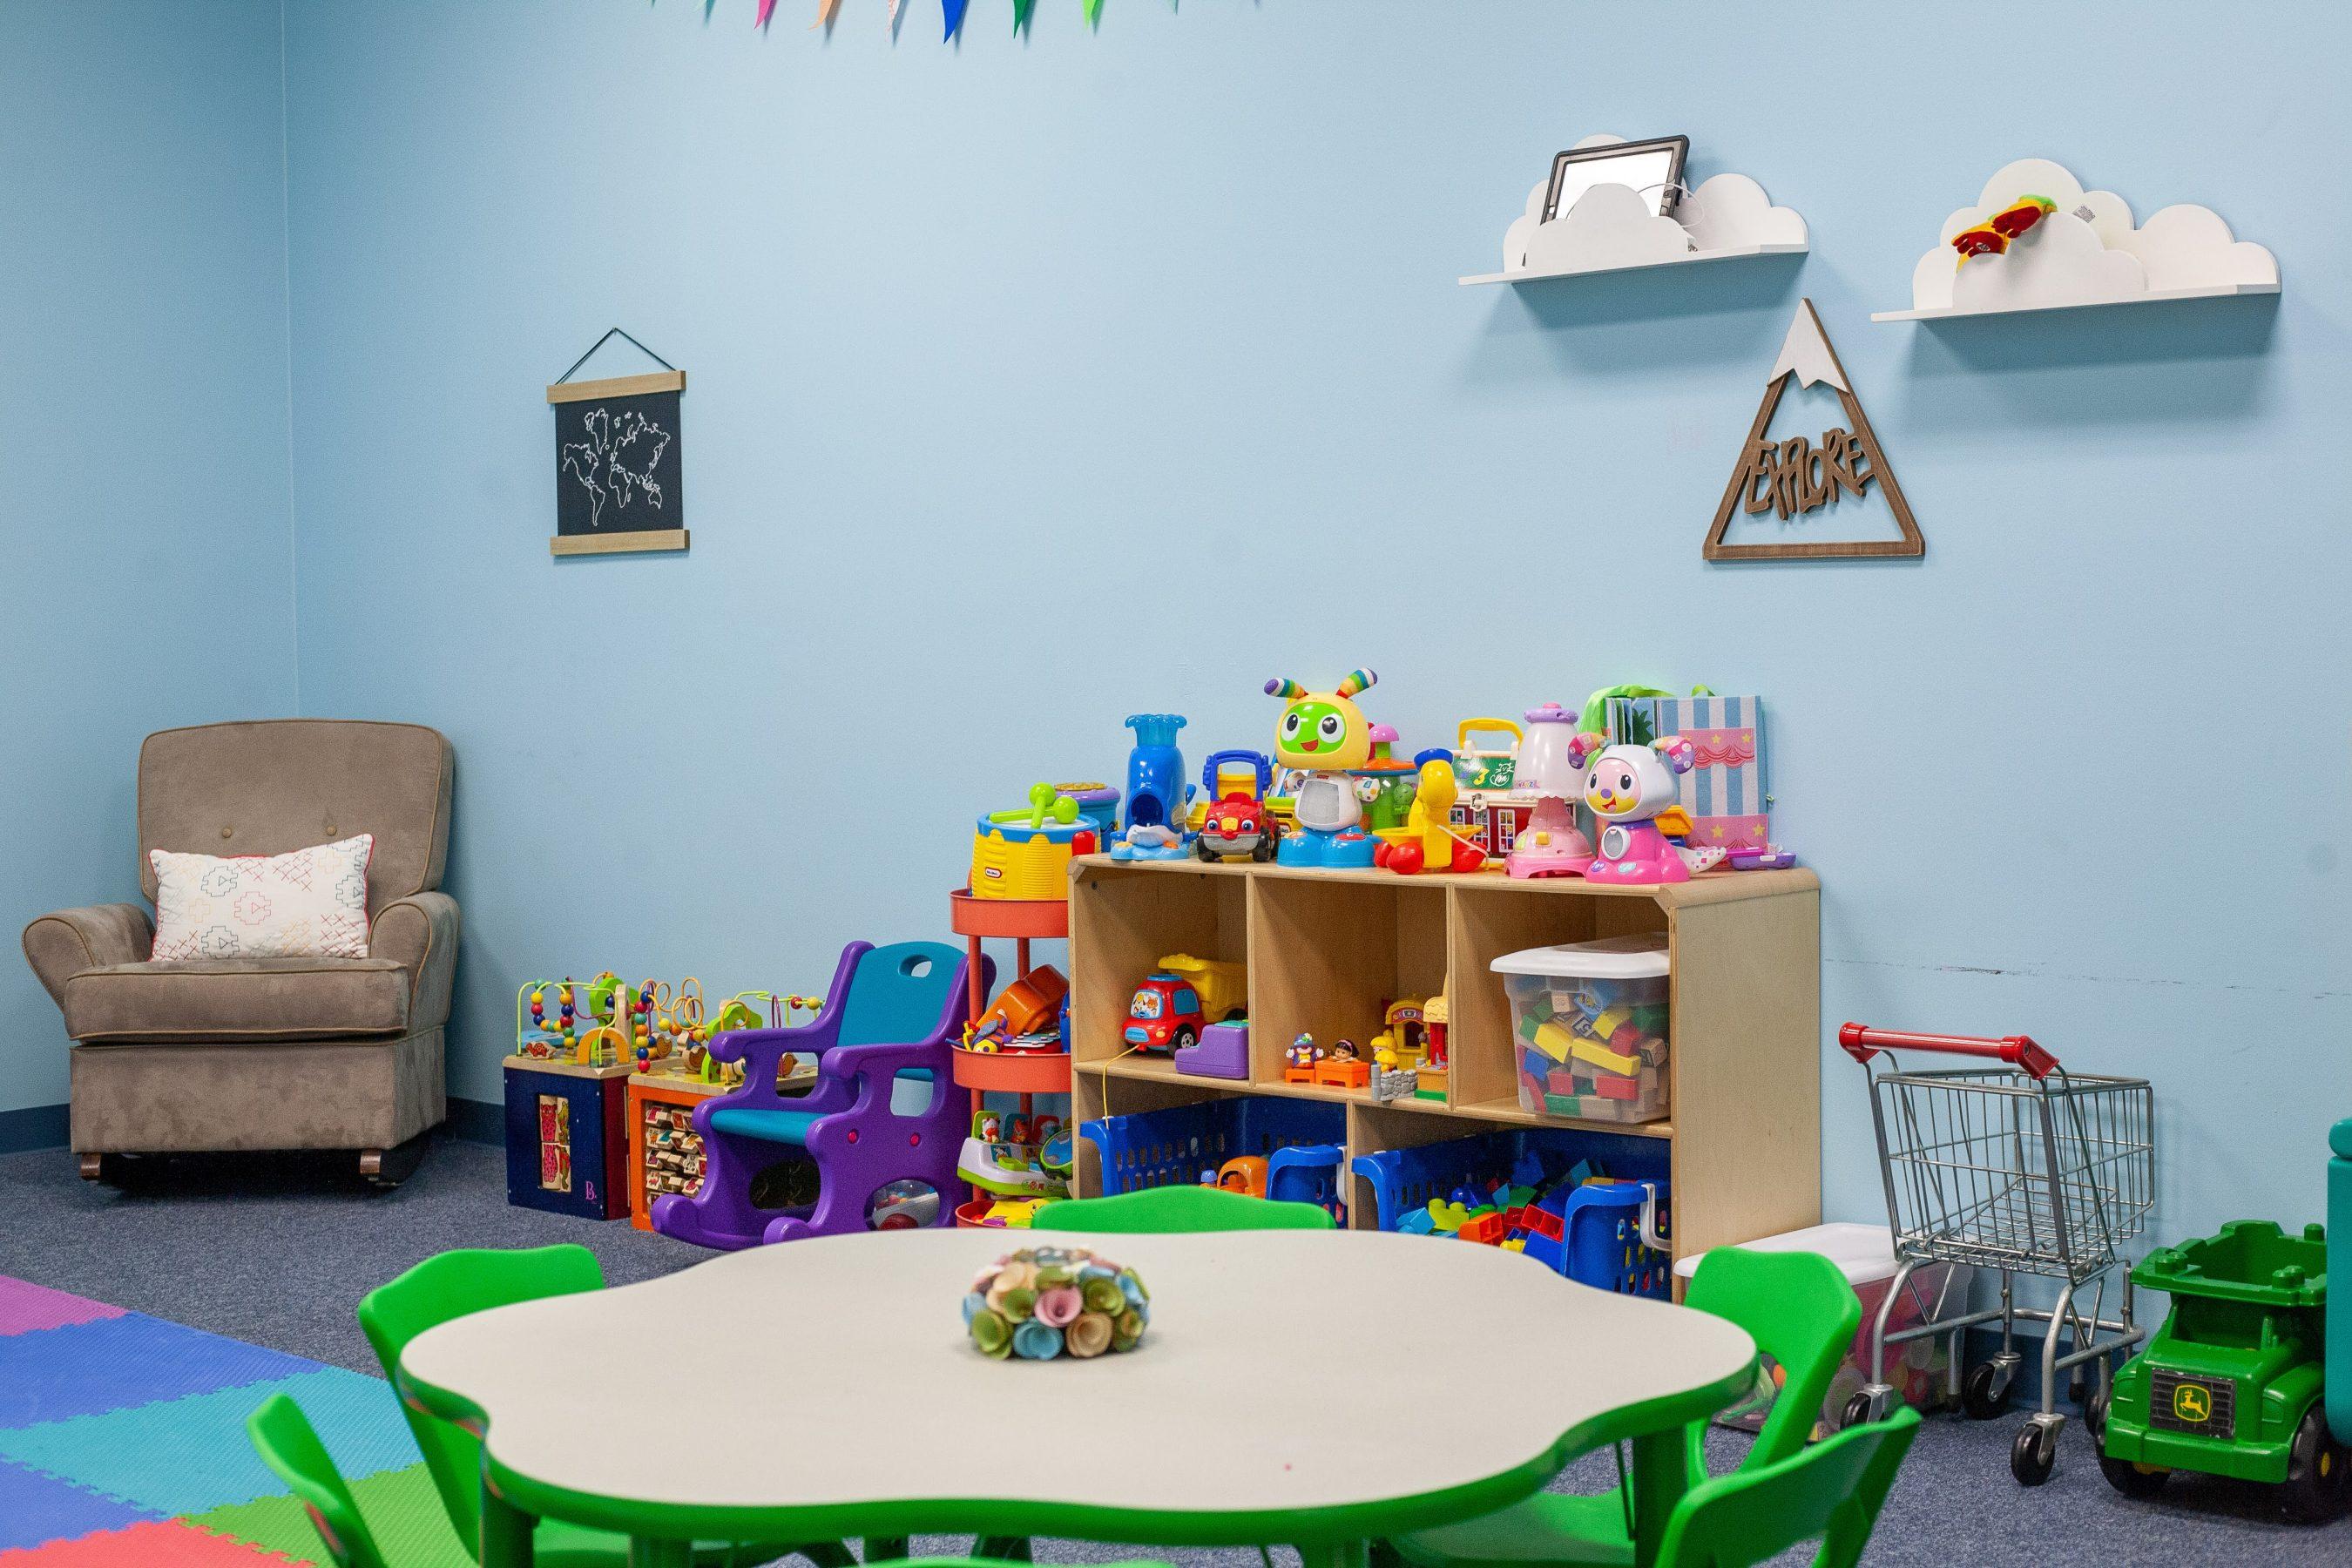 VC Toddler playroom